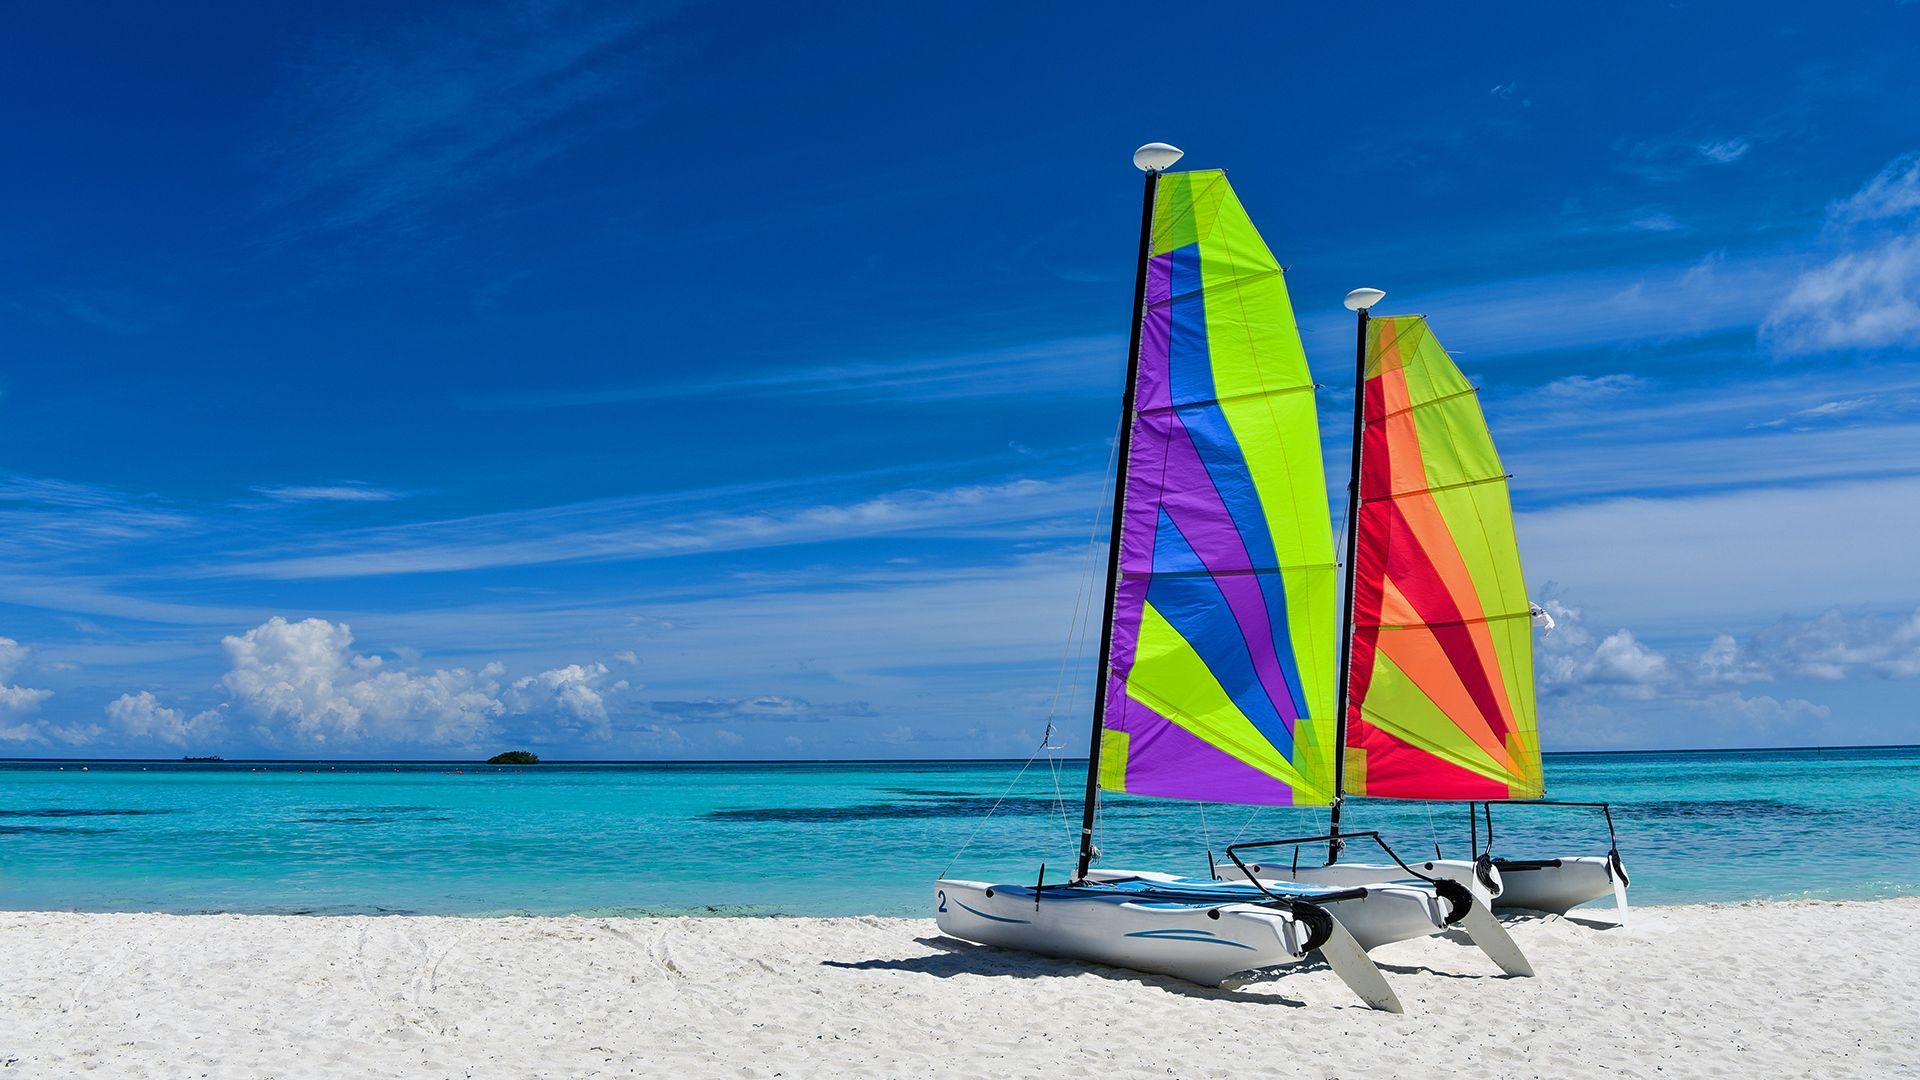 Sejur plaja Maldive, 12 zile - martie 2022